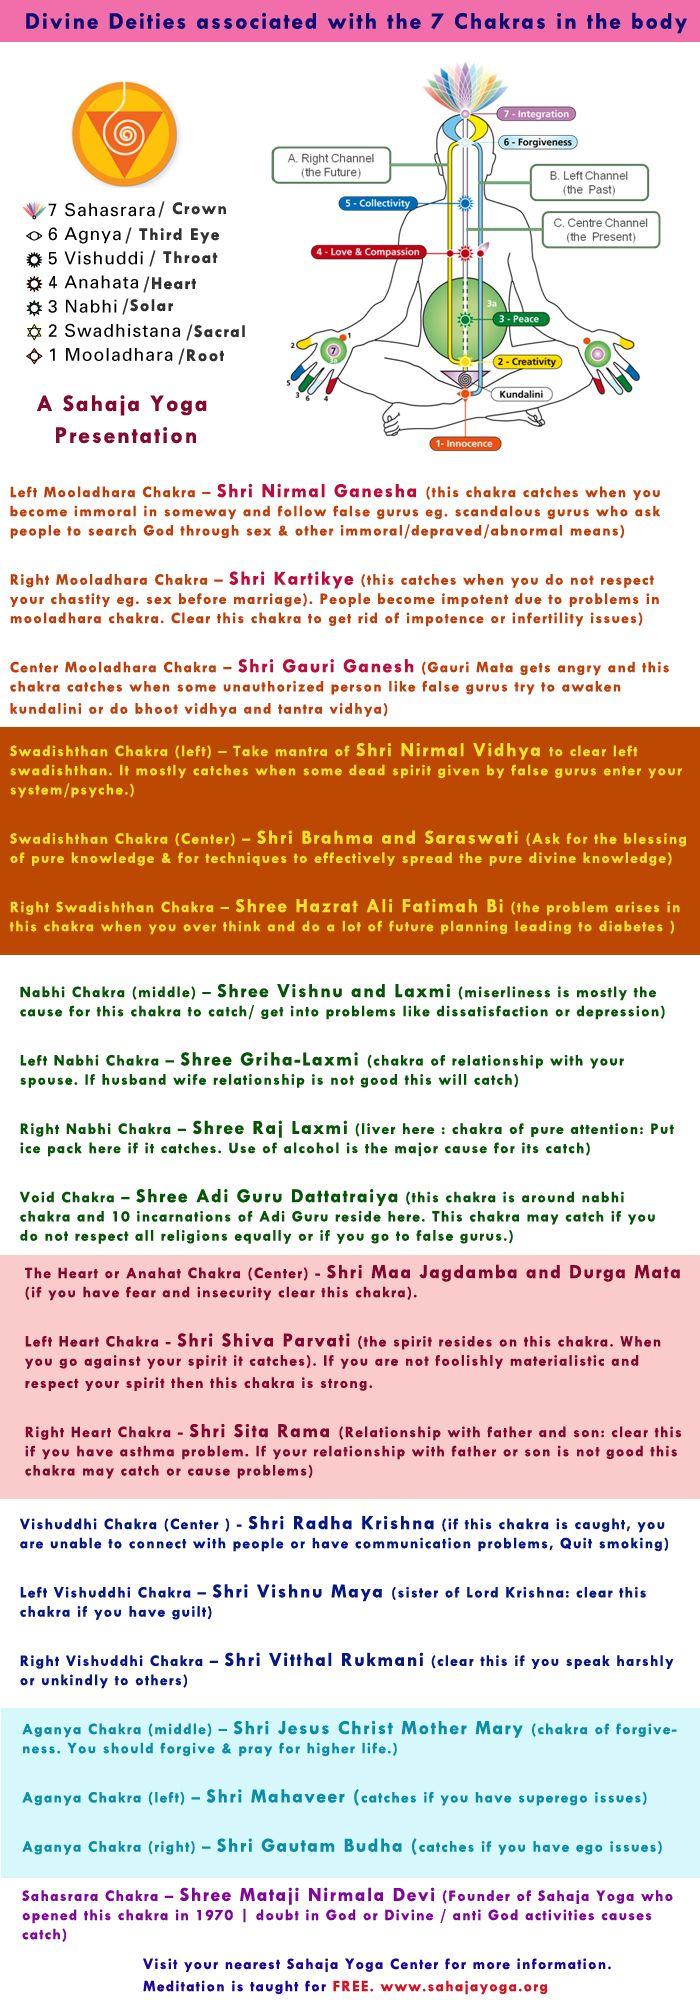 Deities Associated With The 7 Chakras In The Body Divine Deities At A Glance Sahaja Yoga Chakra Healing Music Chakra Yoga